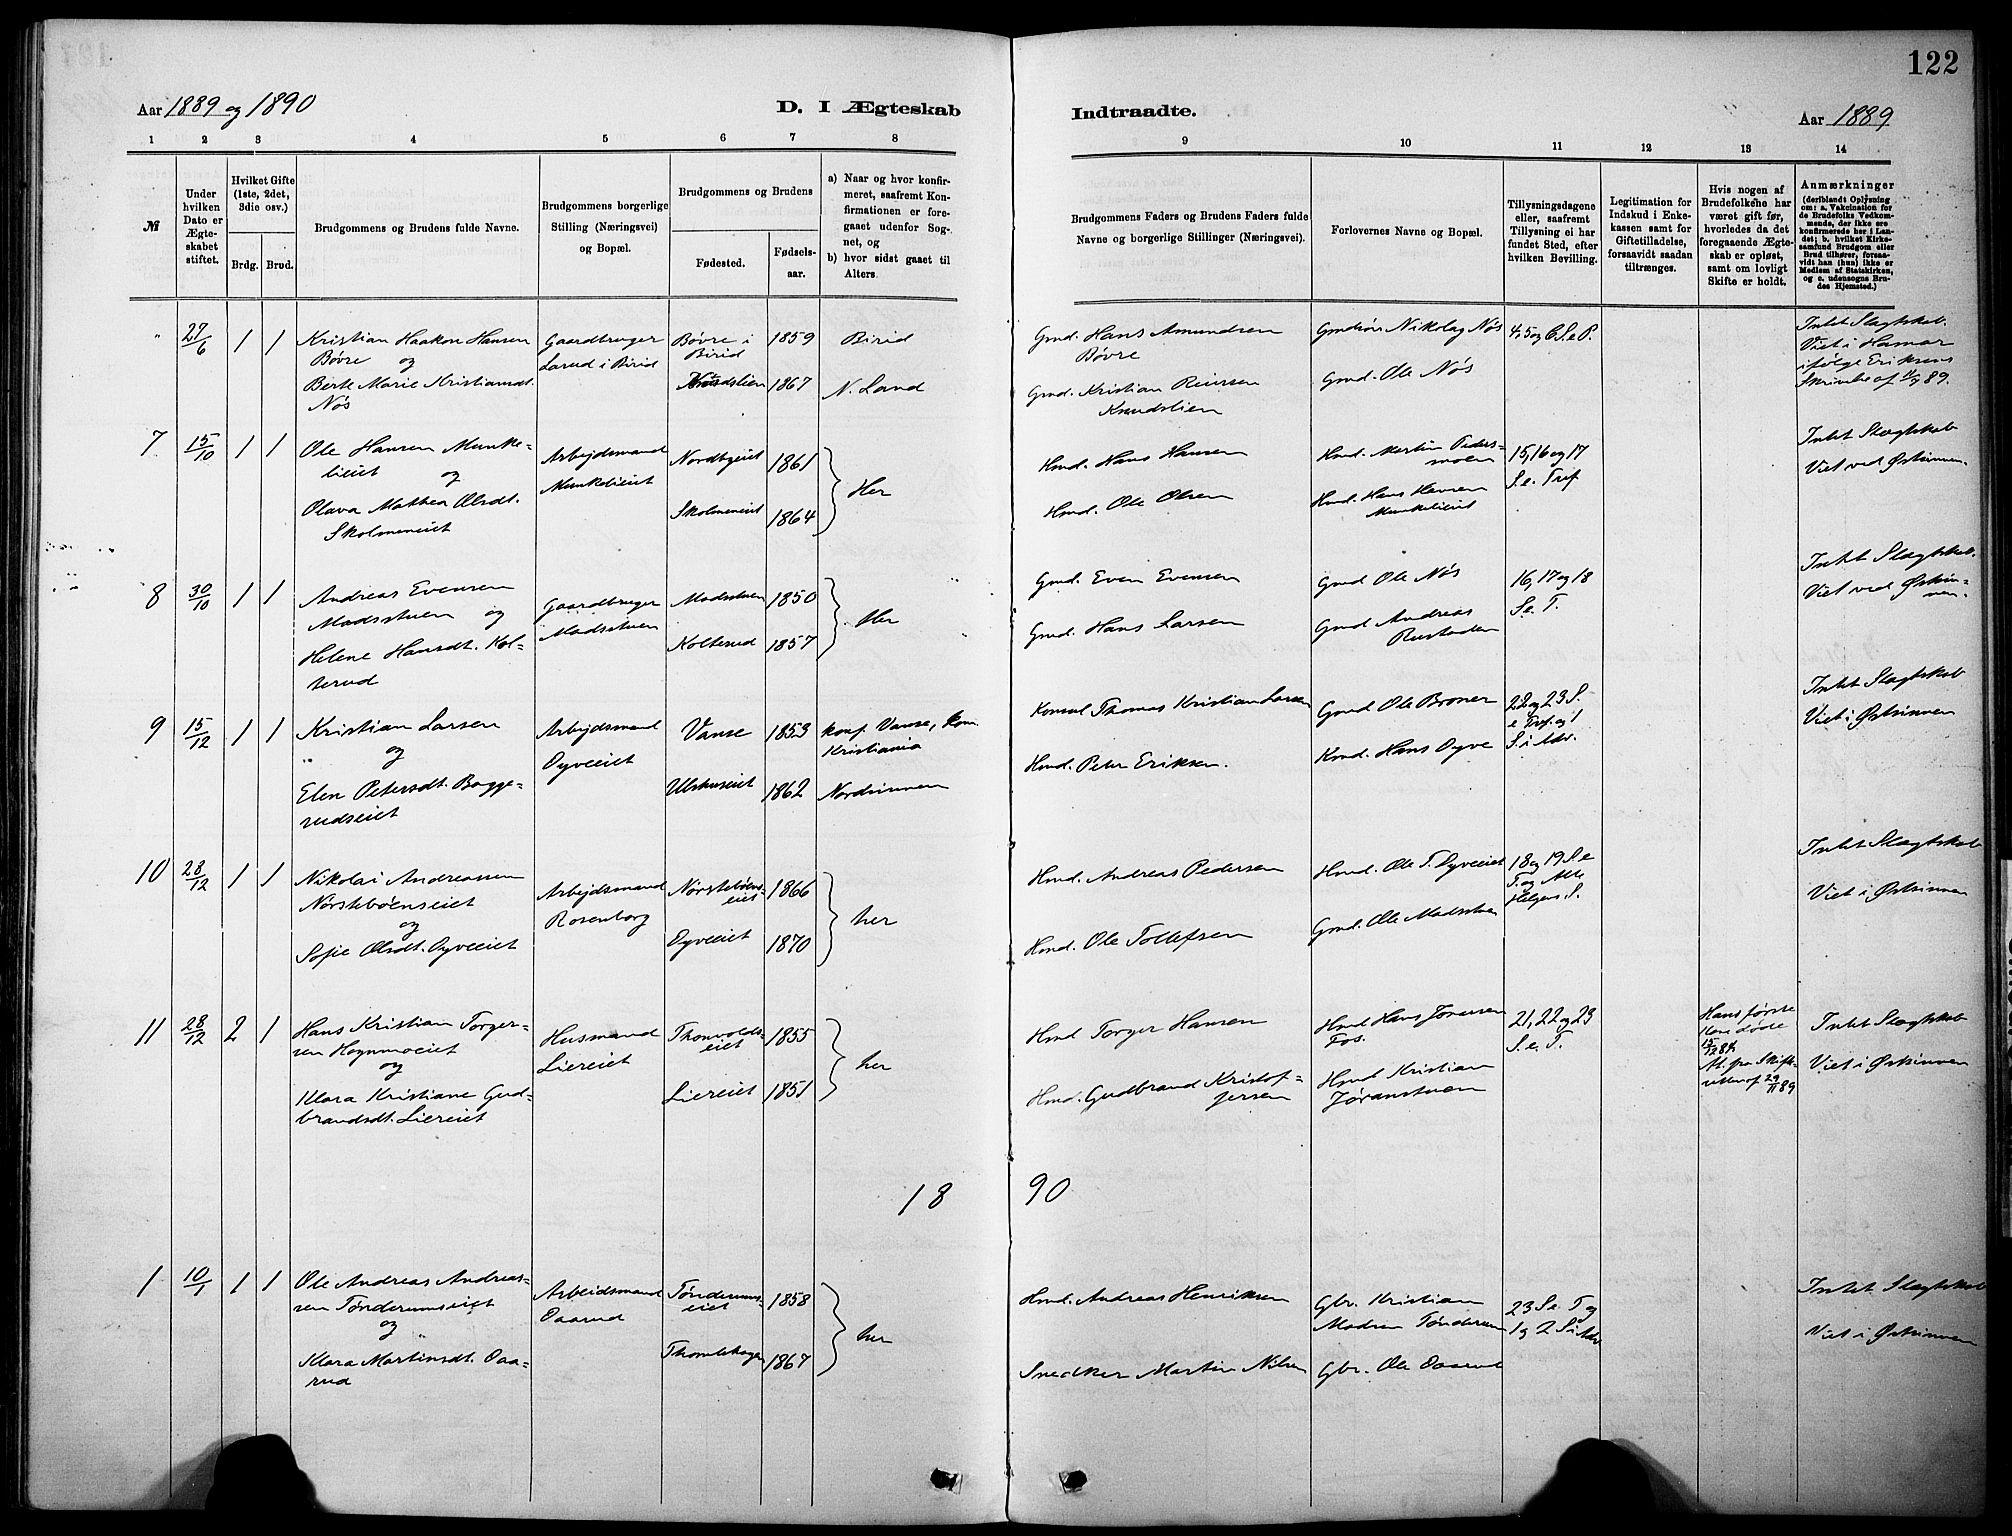 SAH, Nordre Land prestekontor, Ministerialbok nr. 5, 1882-1903, s. 122